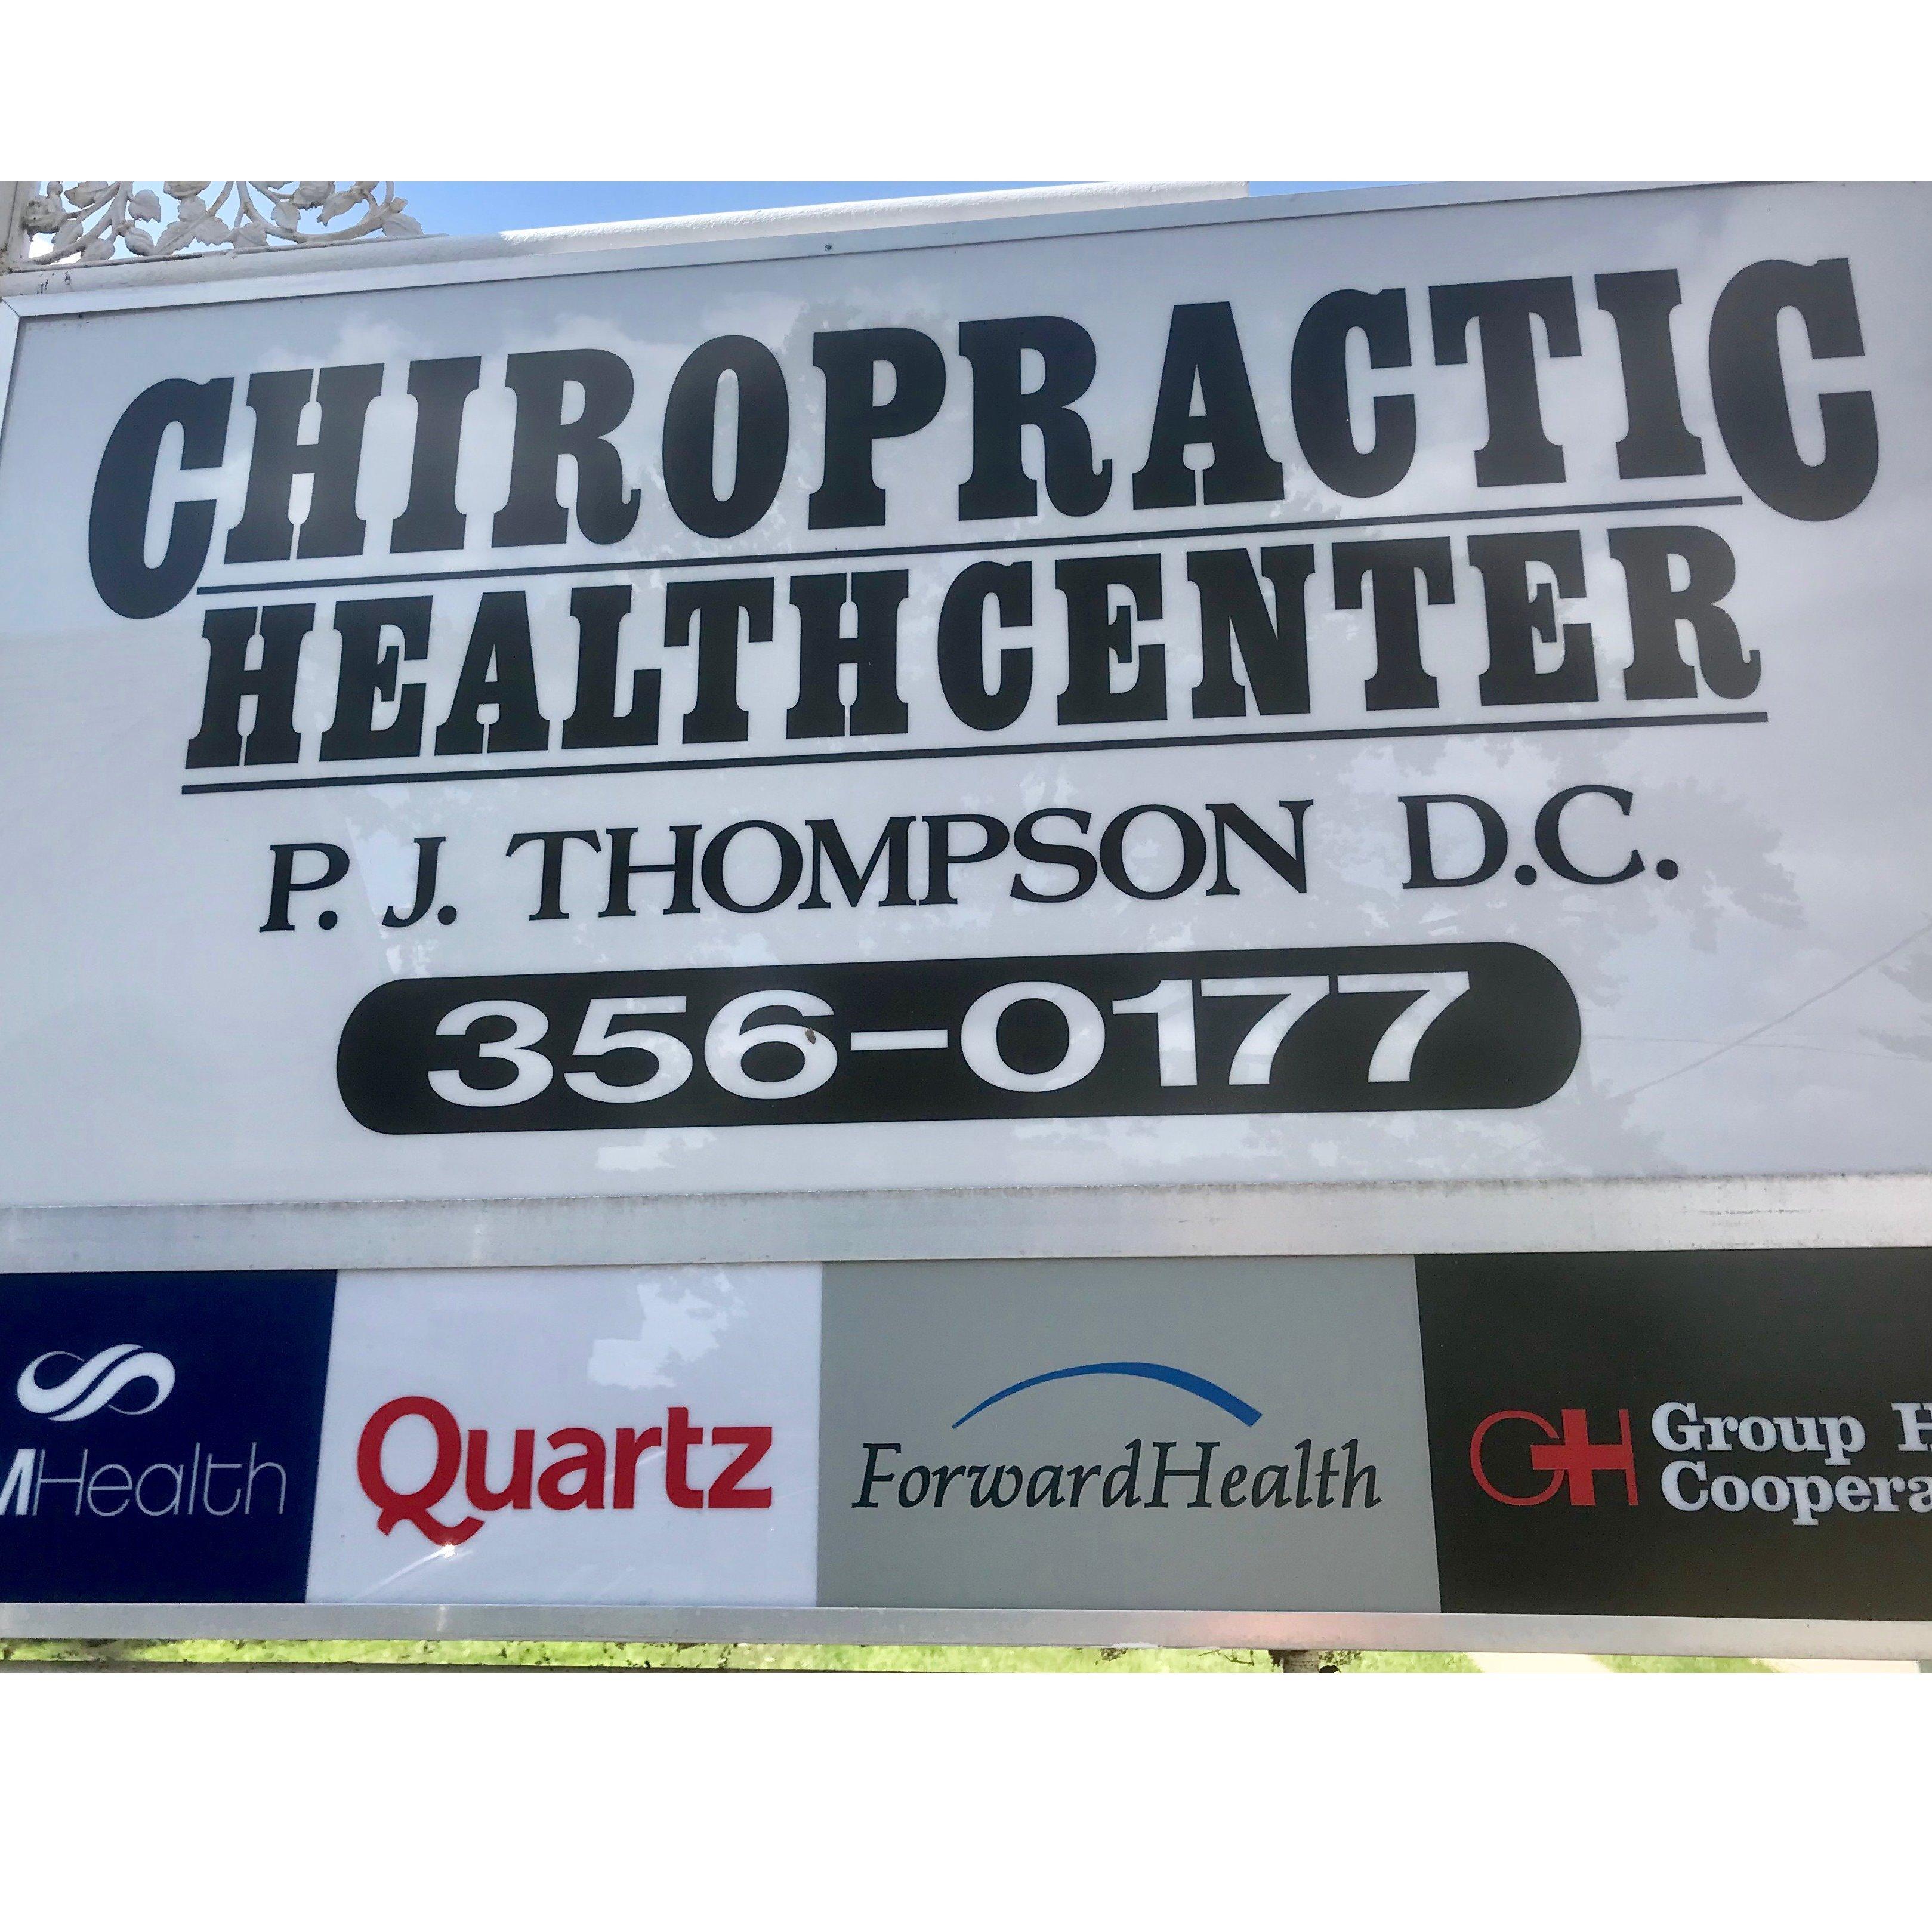 Chiropractic Health Center; Pamela Thompson, D.C.